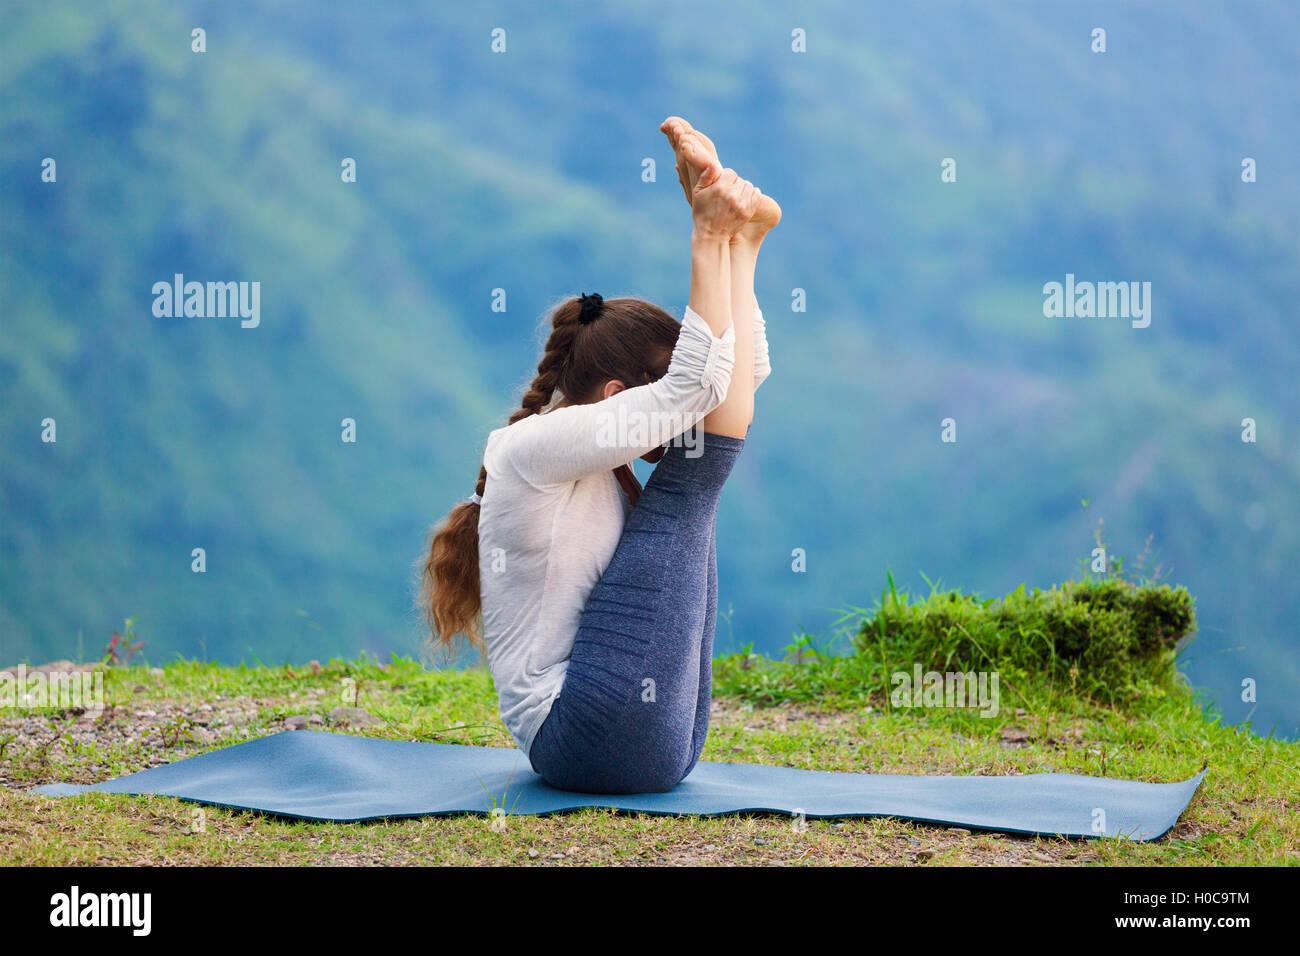 Woman practices yoga asana Urdhva mukha paschimottanasana - Stock Image